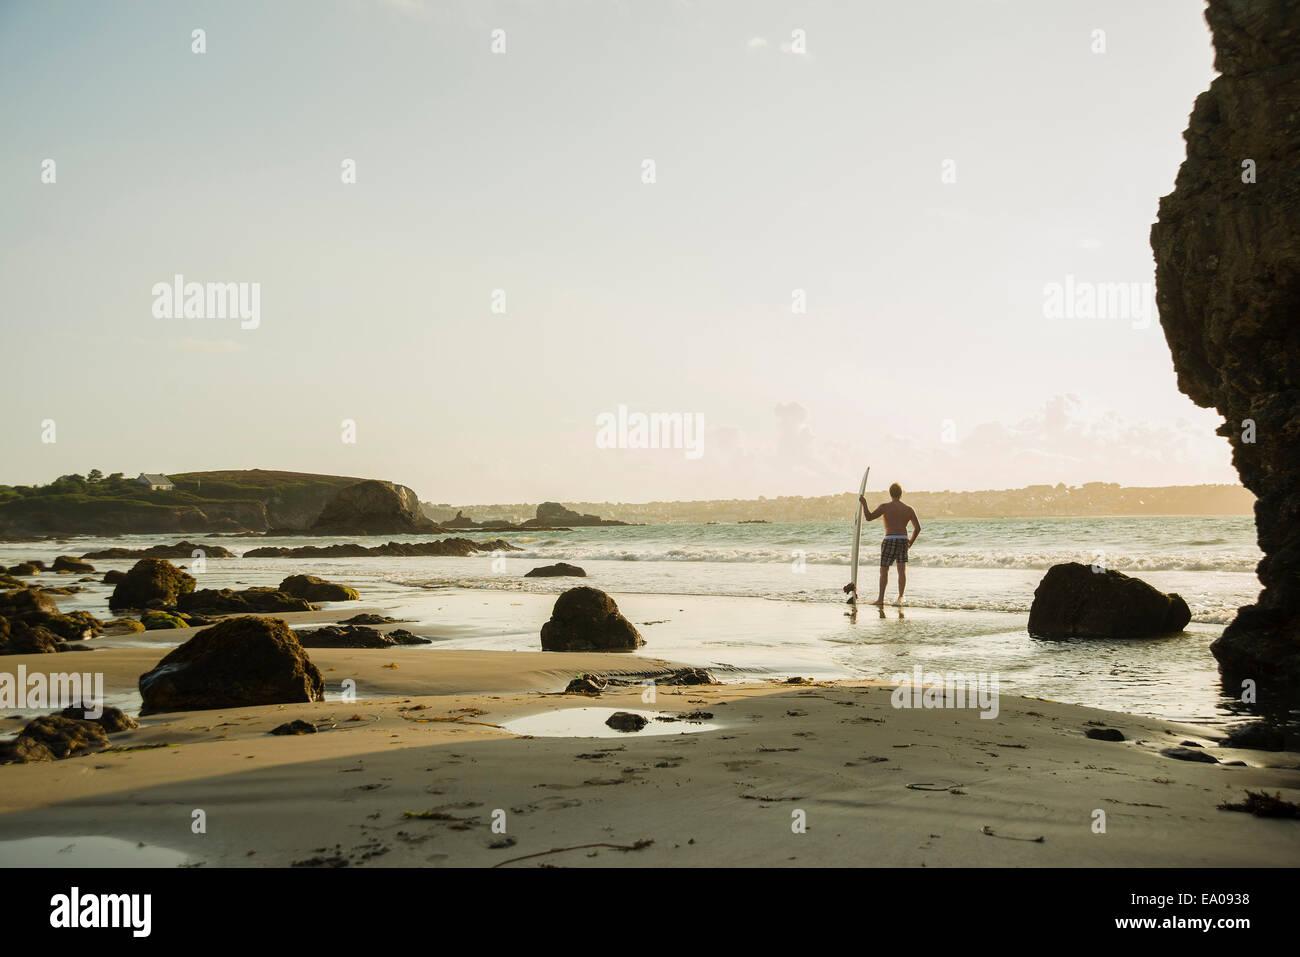 Reifer Mann steht am Rand des Wassers halten Surfbrett Stockbild